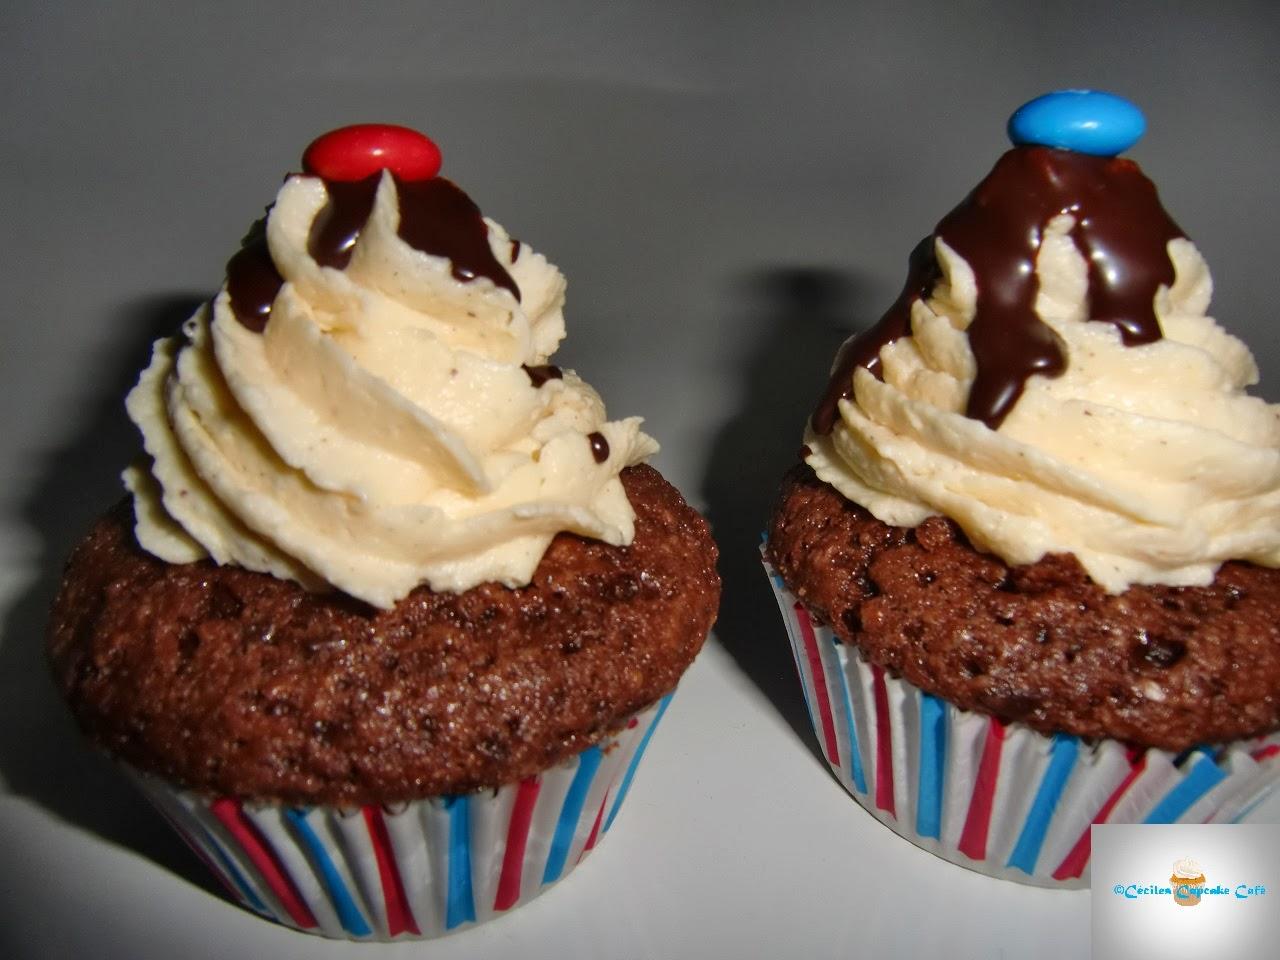 http://cecilecupcakecafe.blogspot.de/2014/02/m-uberraschungs-cupcakes.html